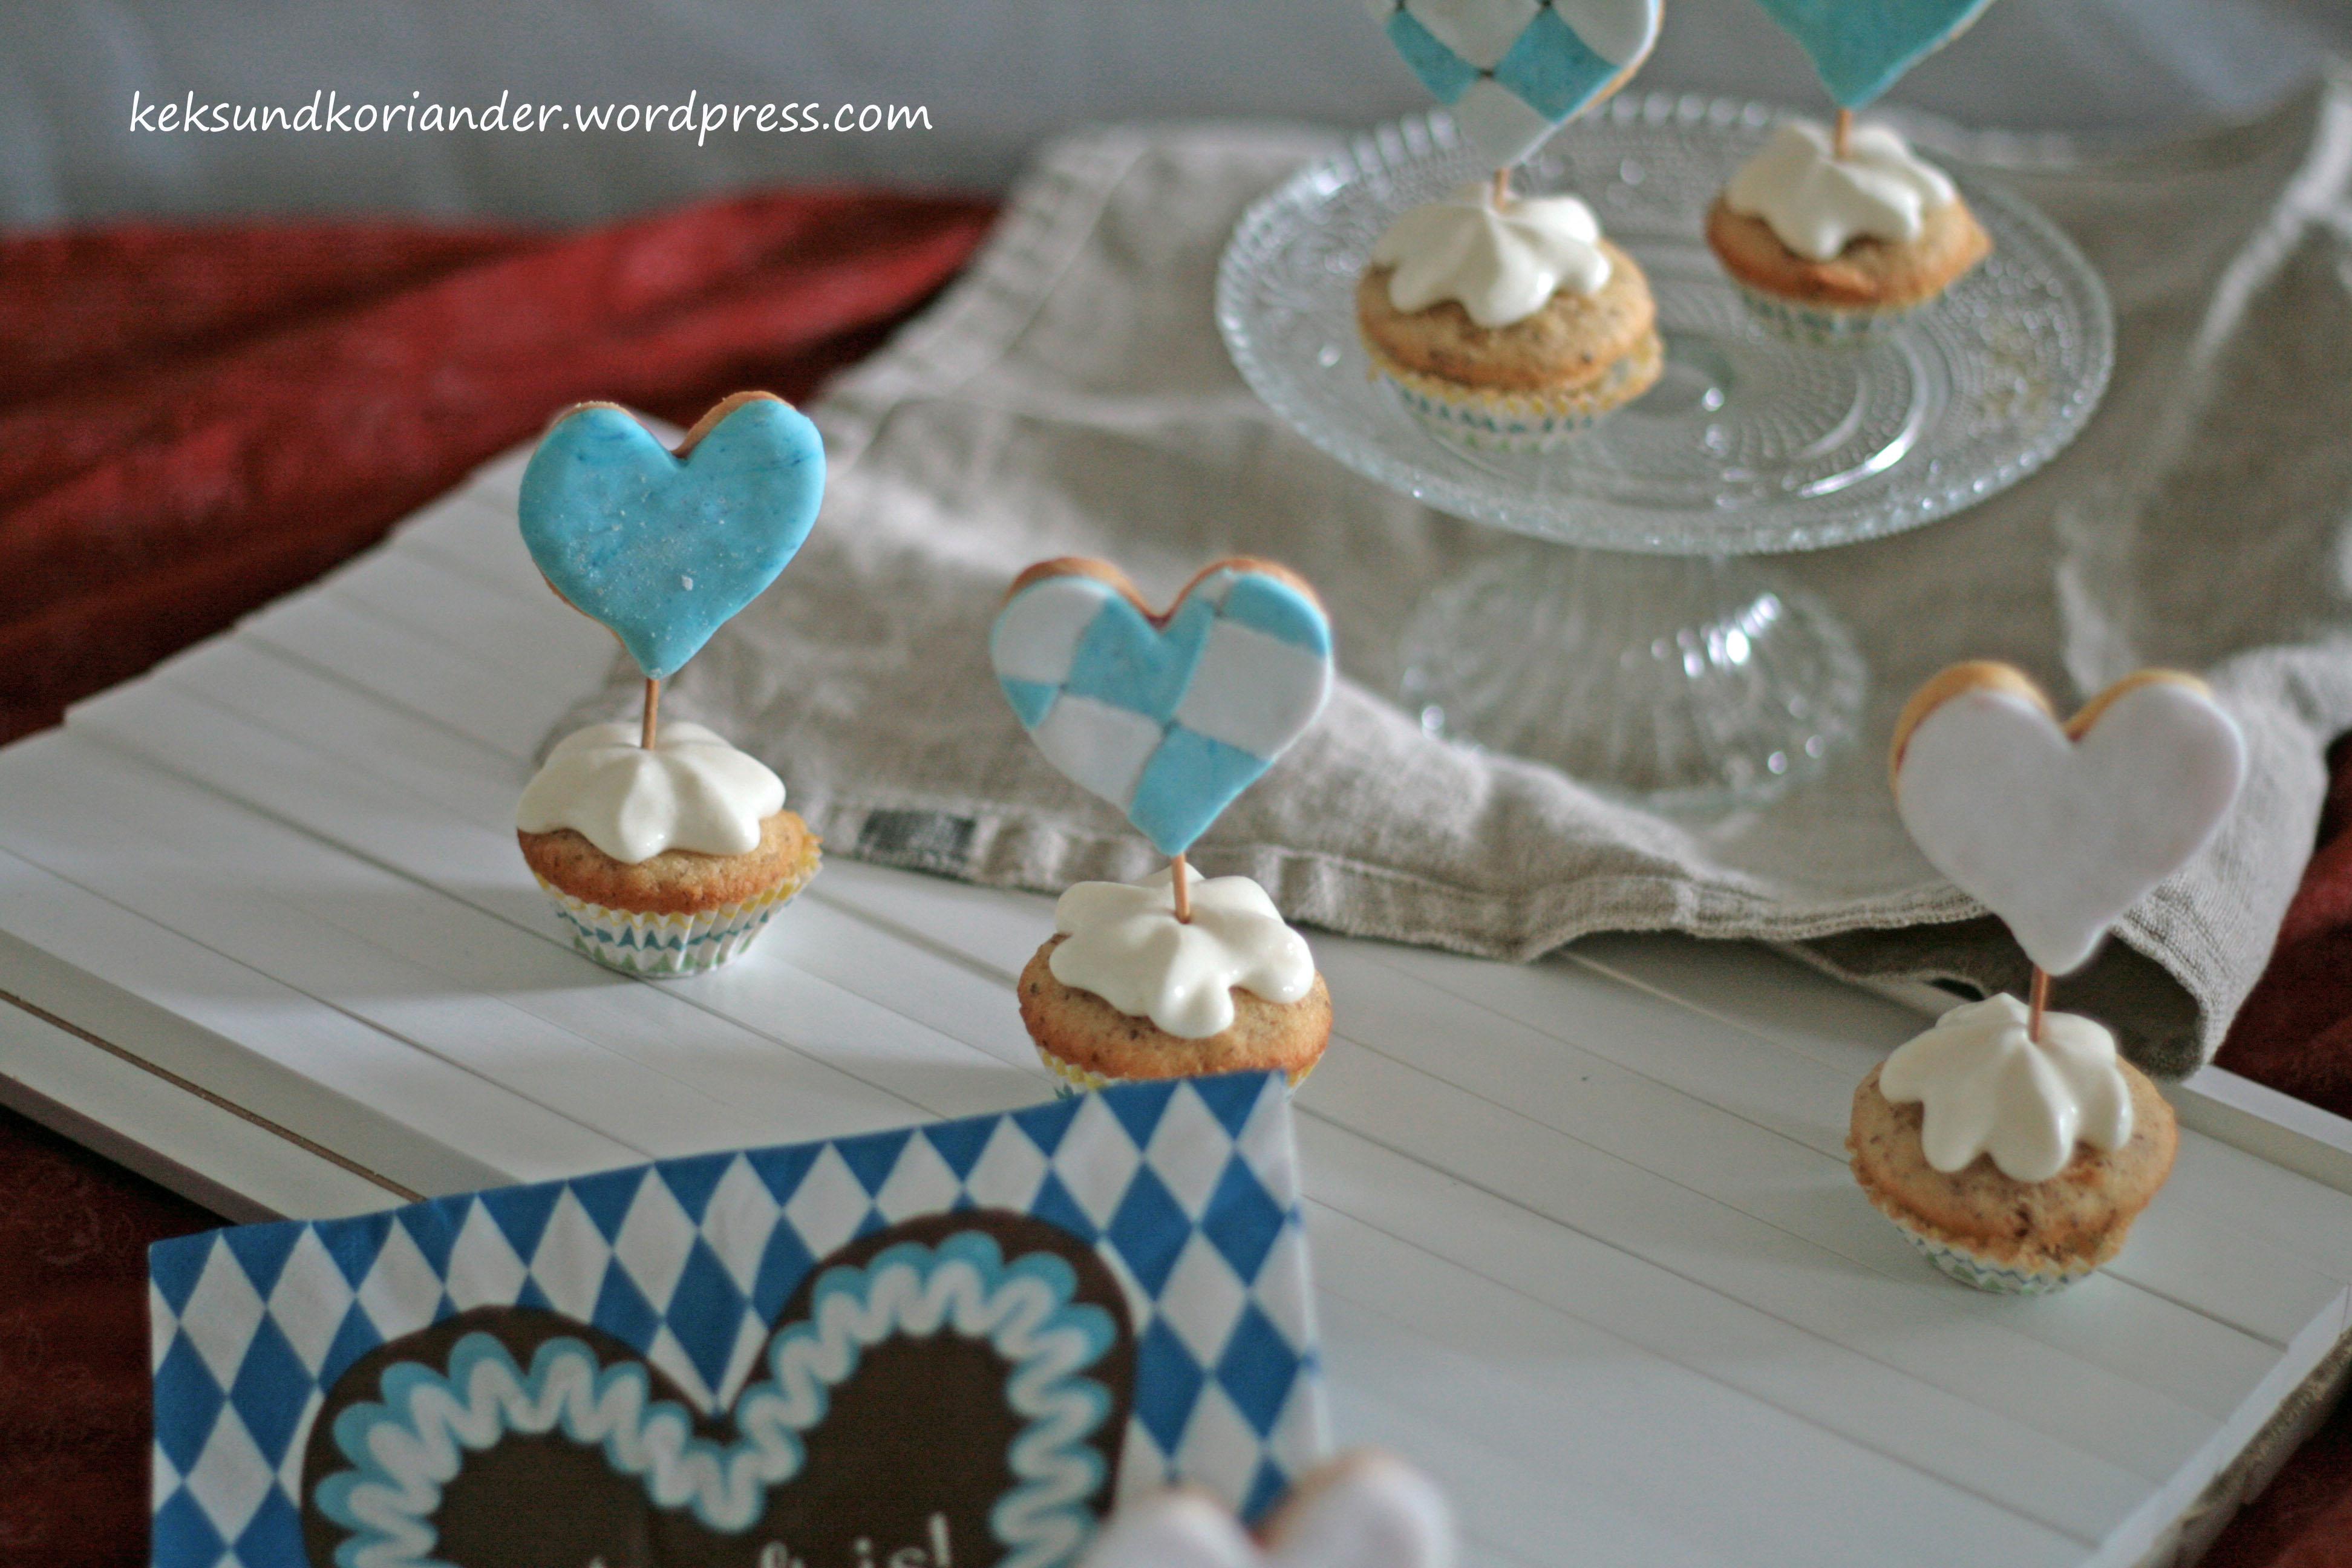 Cupcake Muffins Nussmuffin Topping Keks Wiesn3